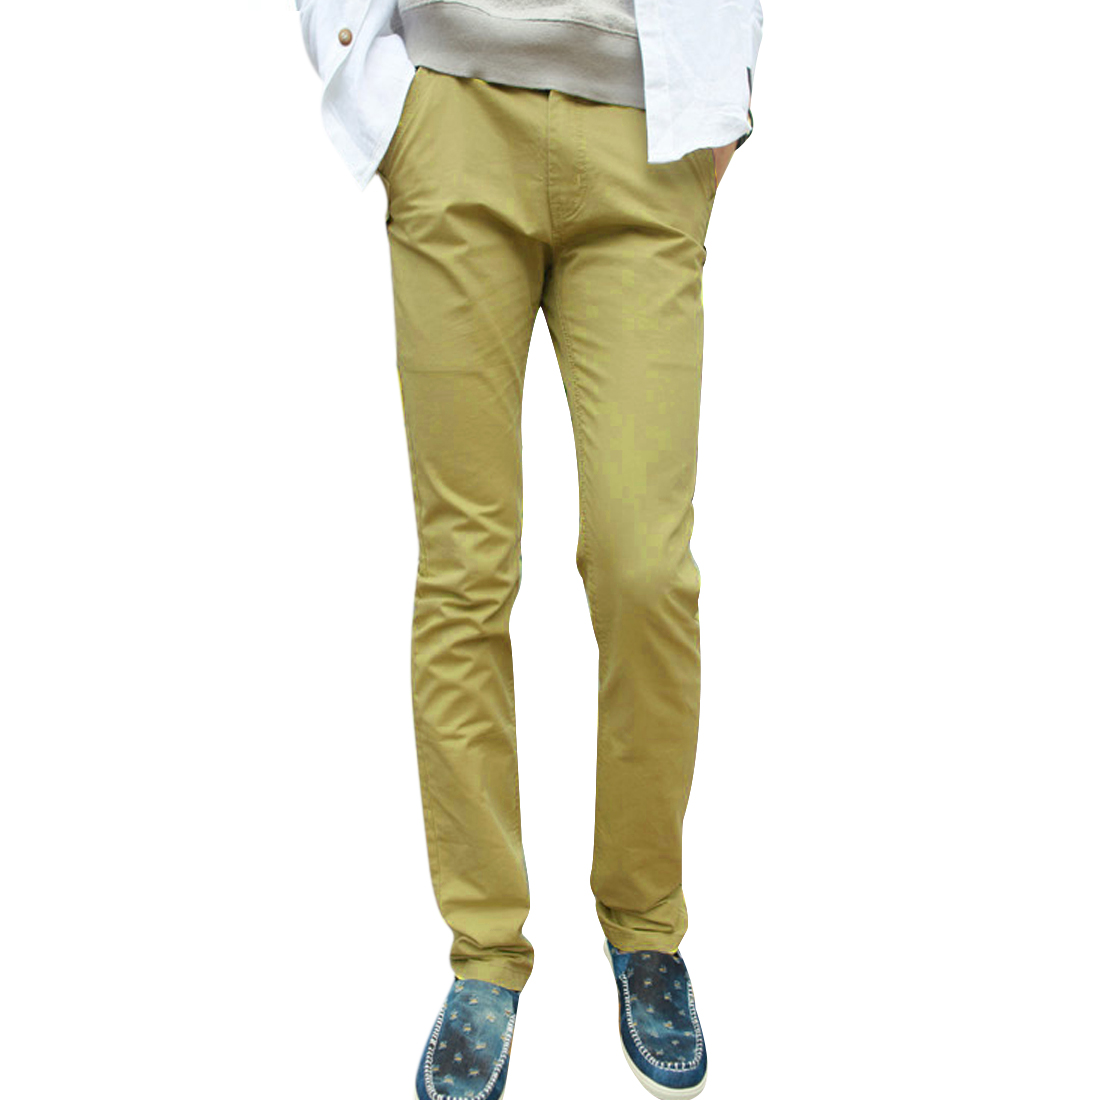 Man Chic Light Moss Color Belt Loop Design Slim Fit Casual Long Pants W33